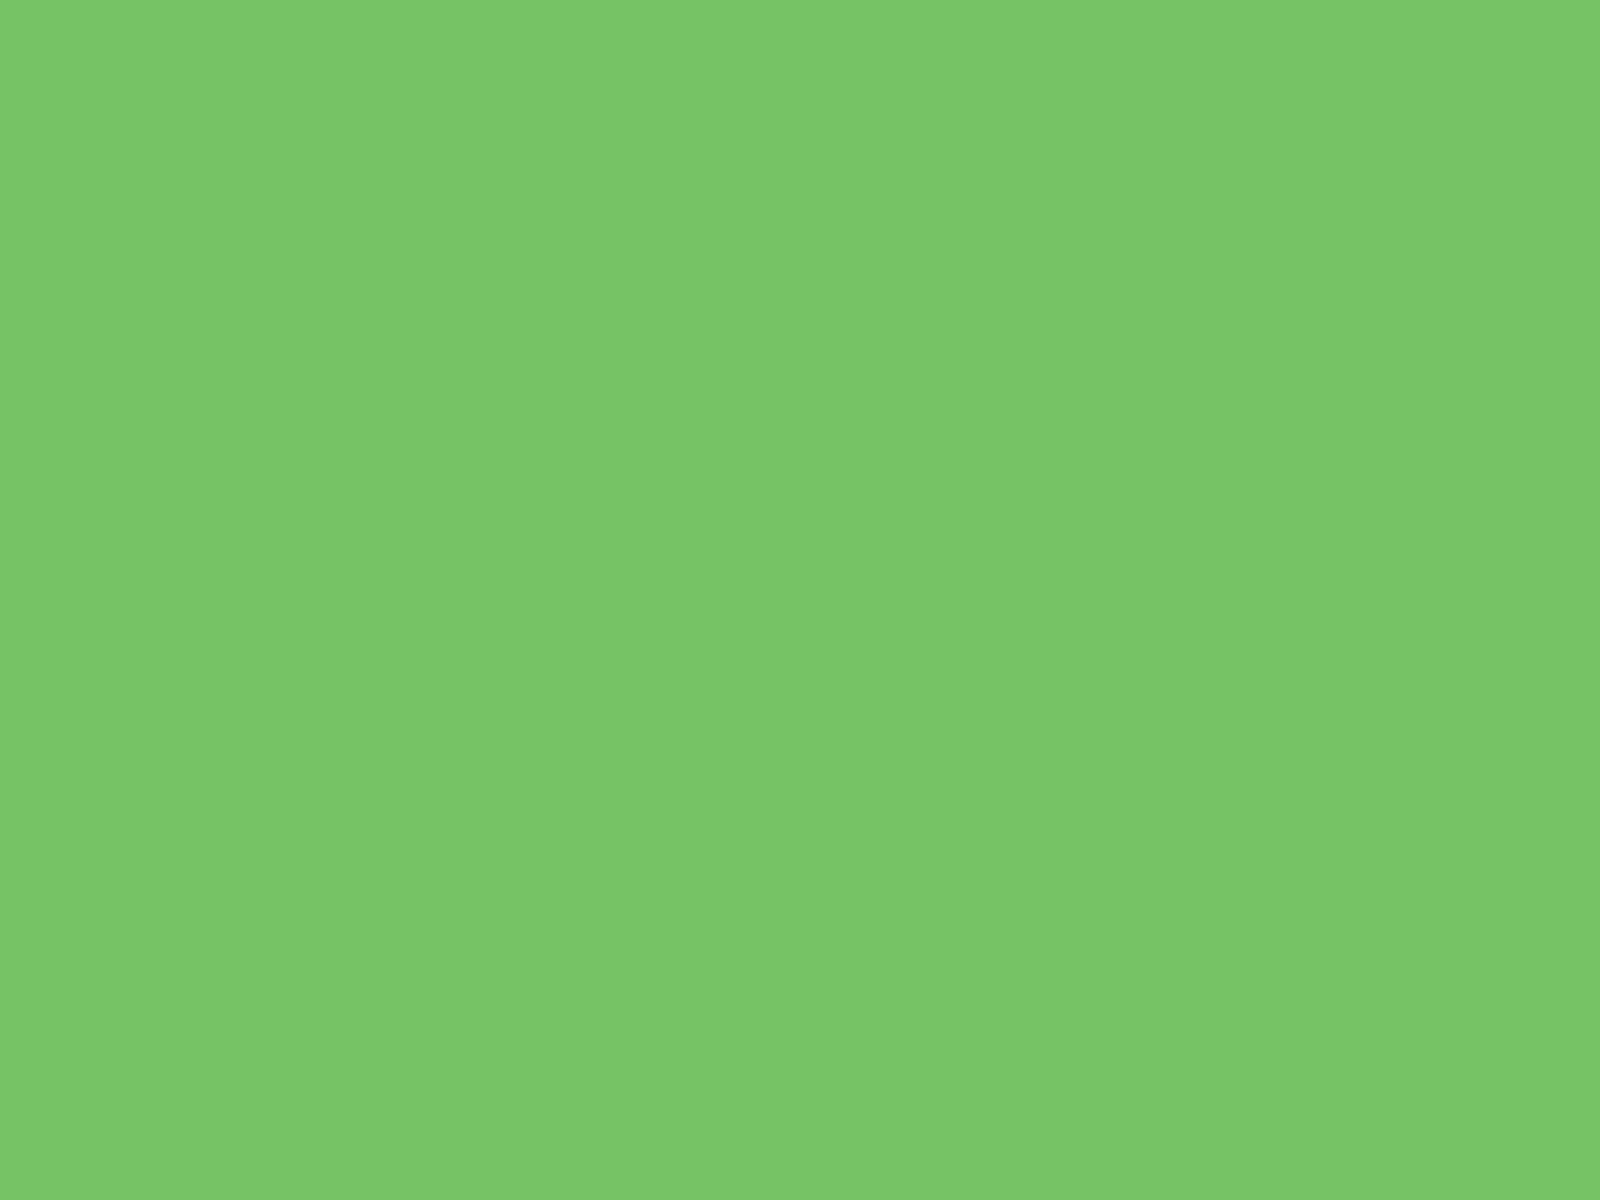 1600x1200 Mantis Solid Color Background